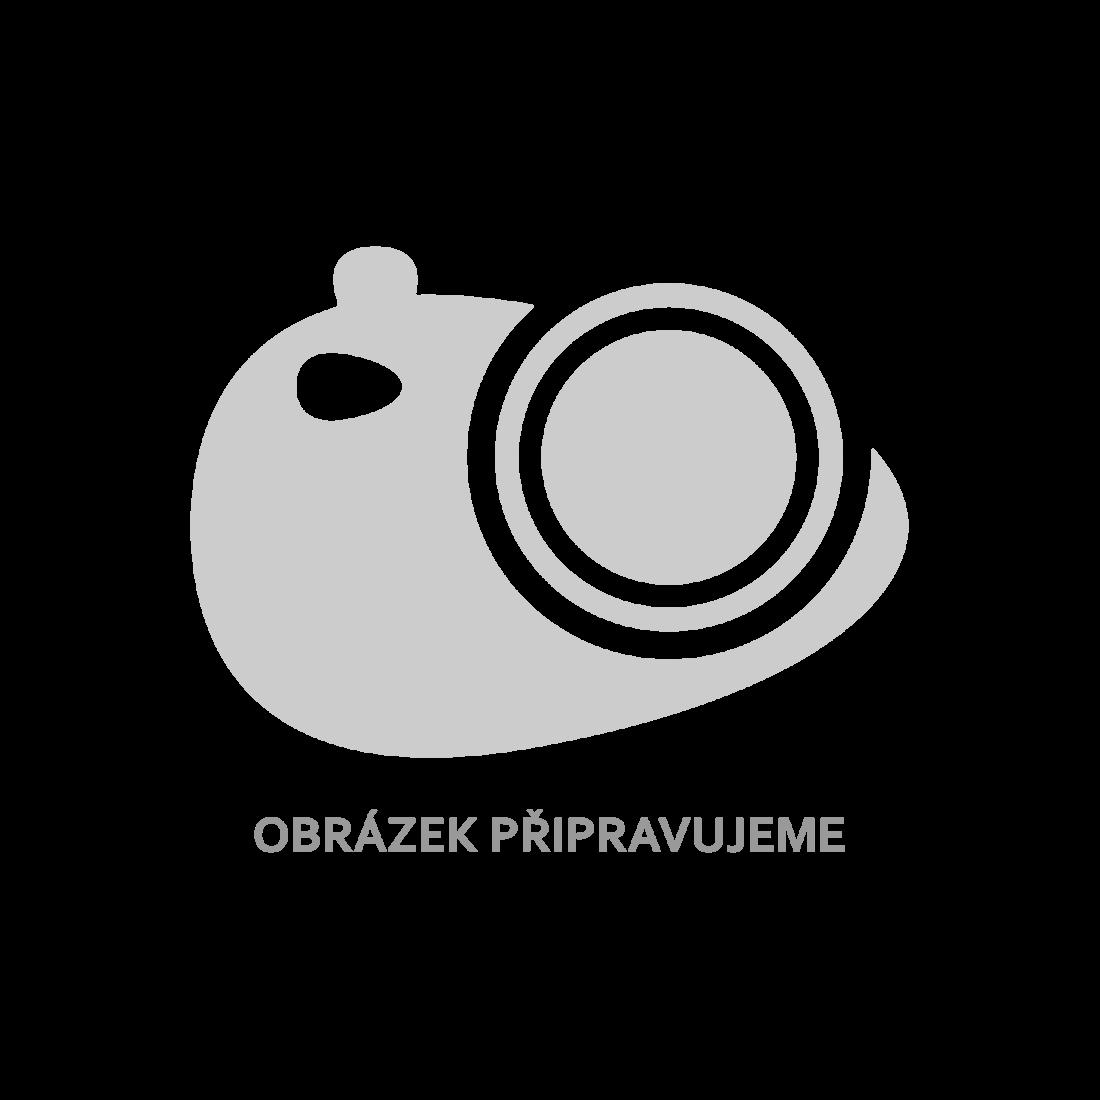 Roleta Zebra / noc a den / Twinroll 90 x 150 cm, kávová